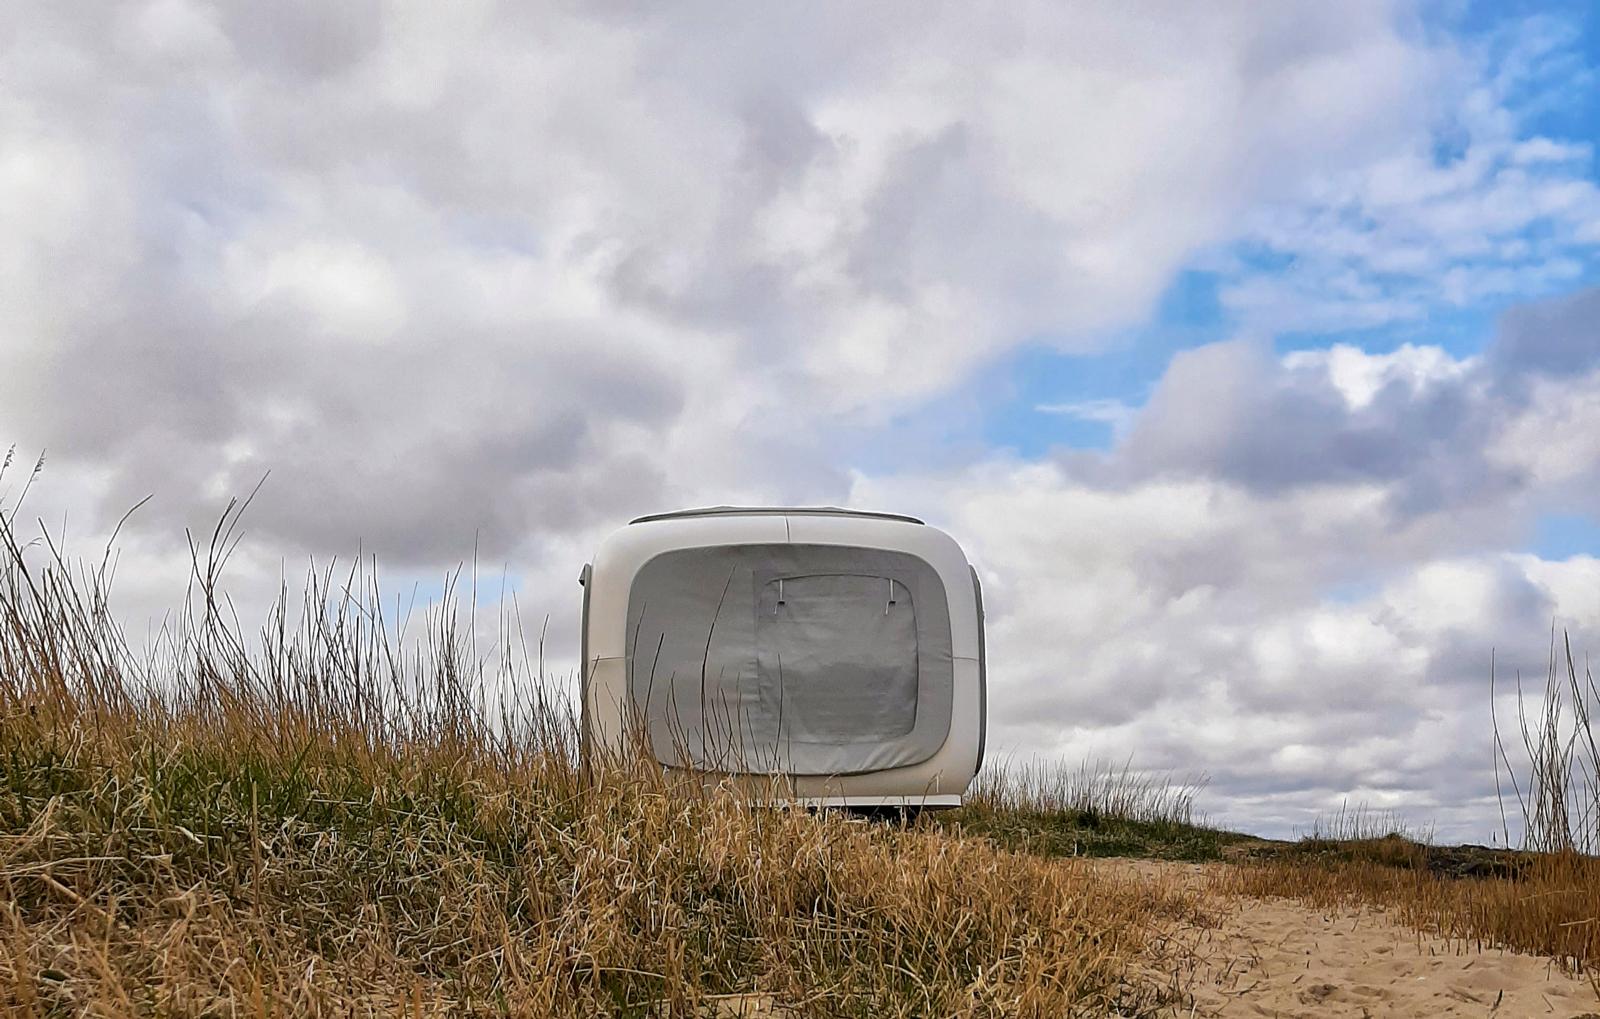 sleeperoo-cube-1-uen-preis-b-fr-so-ottendorf-kap-jakob-bg3